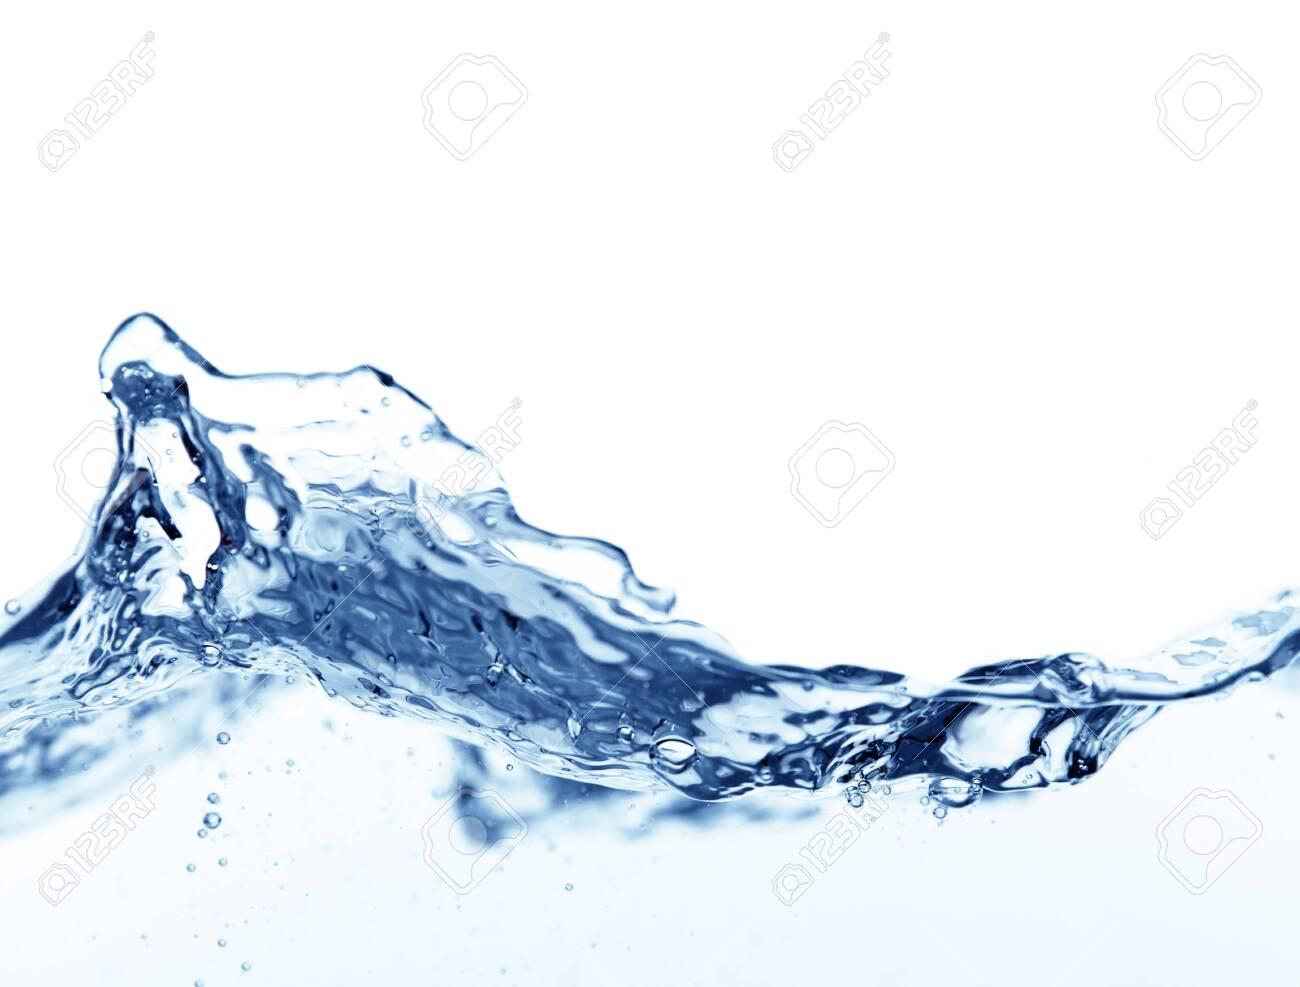 Water wave splash isolated on white - 127161433